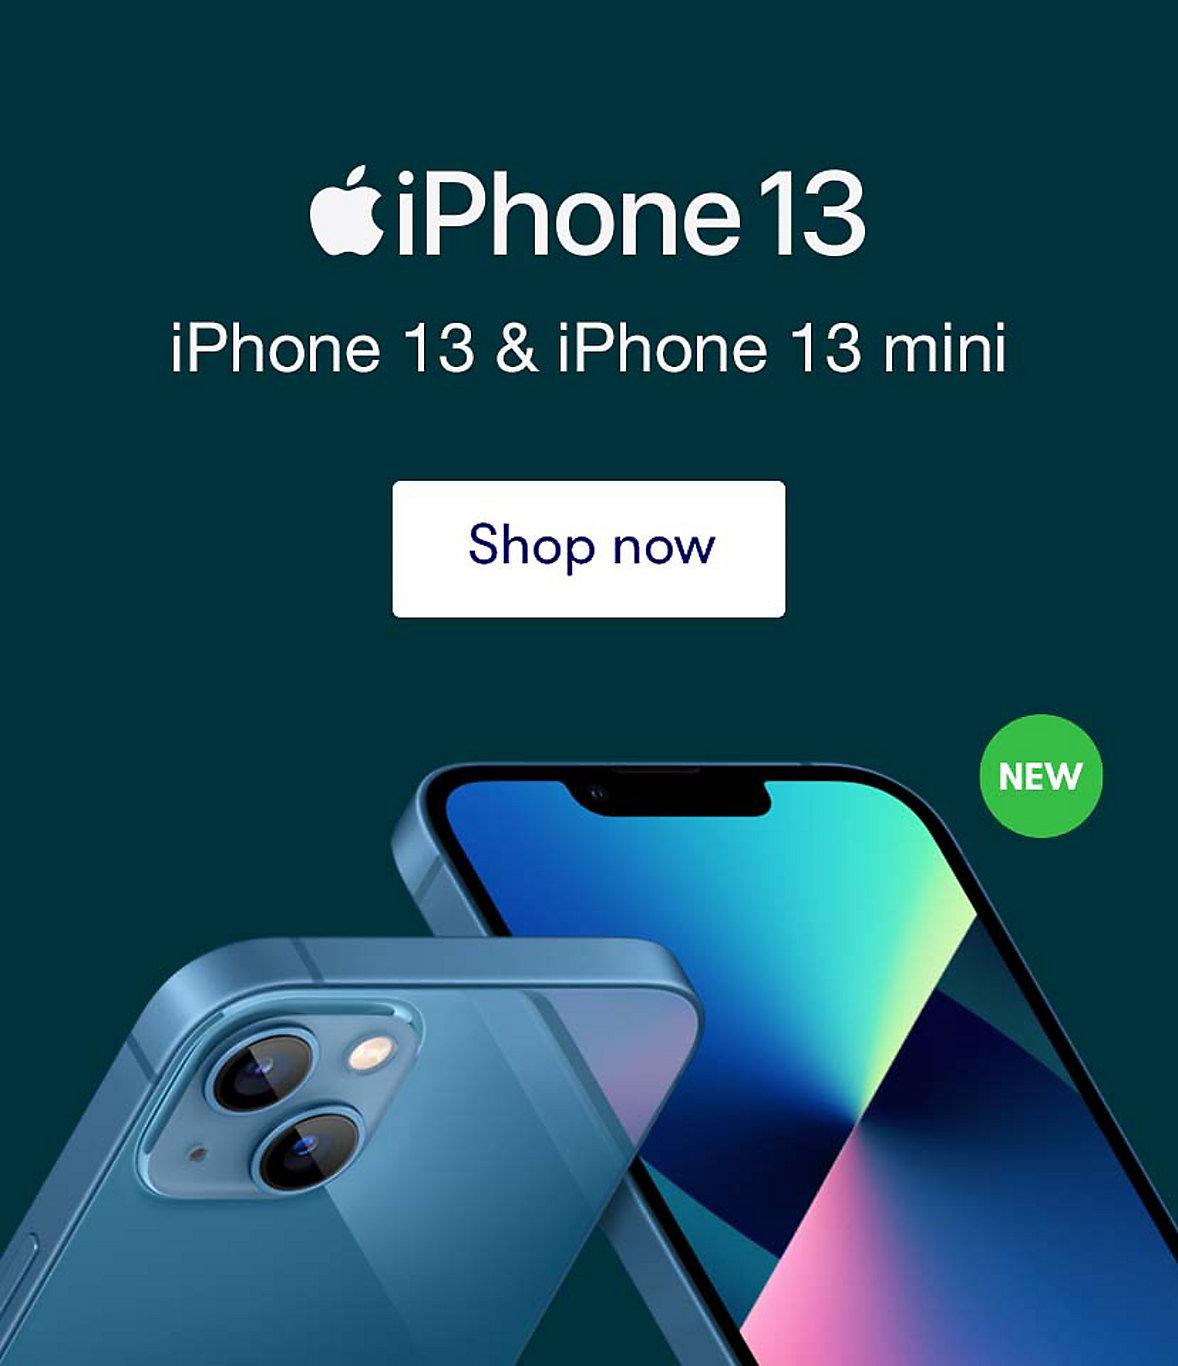 Shop iPhone 13 & iPhone 13 mini now